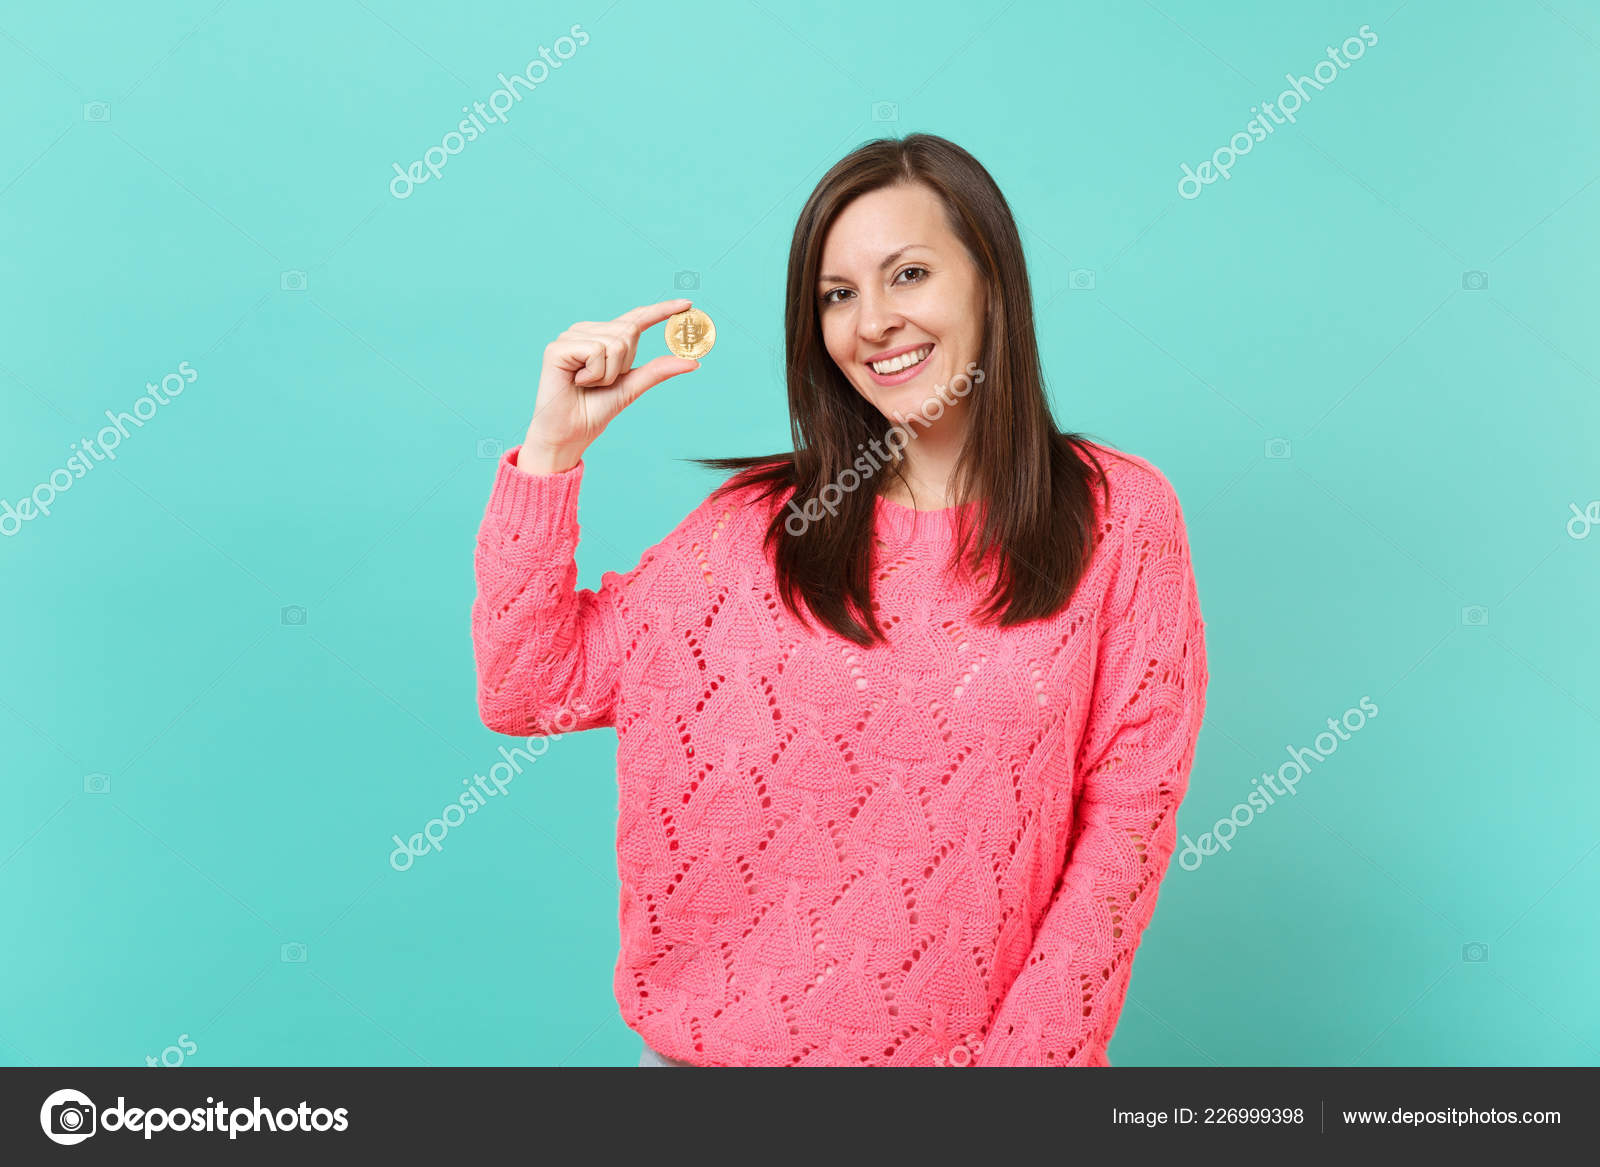 2dc2c3a00434 Πορτραίτο Του Χαμογελώντας Νεαρή Γυναίκα Στο Πλεκτό Πουλόβερ Ροζ Κρατώντας  — Φωτογραφία Αρχείου